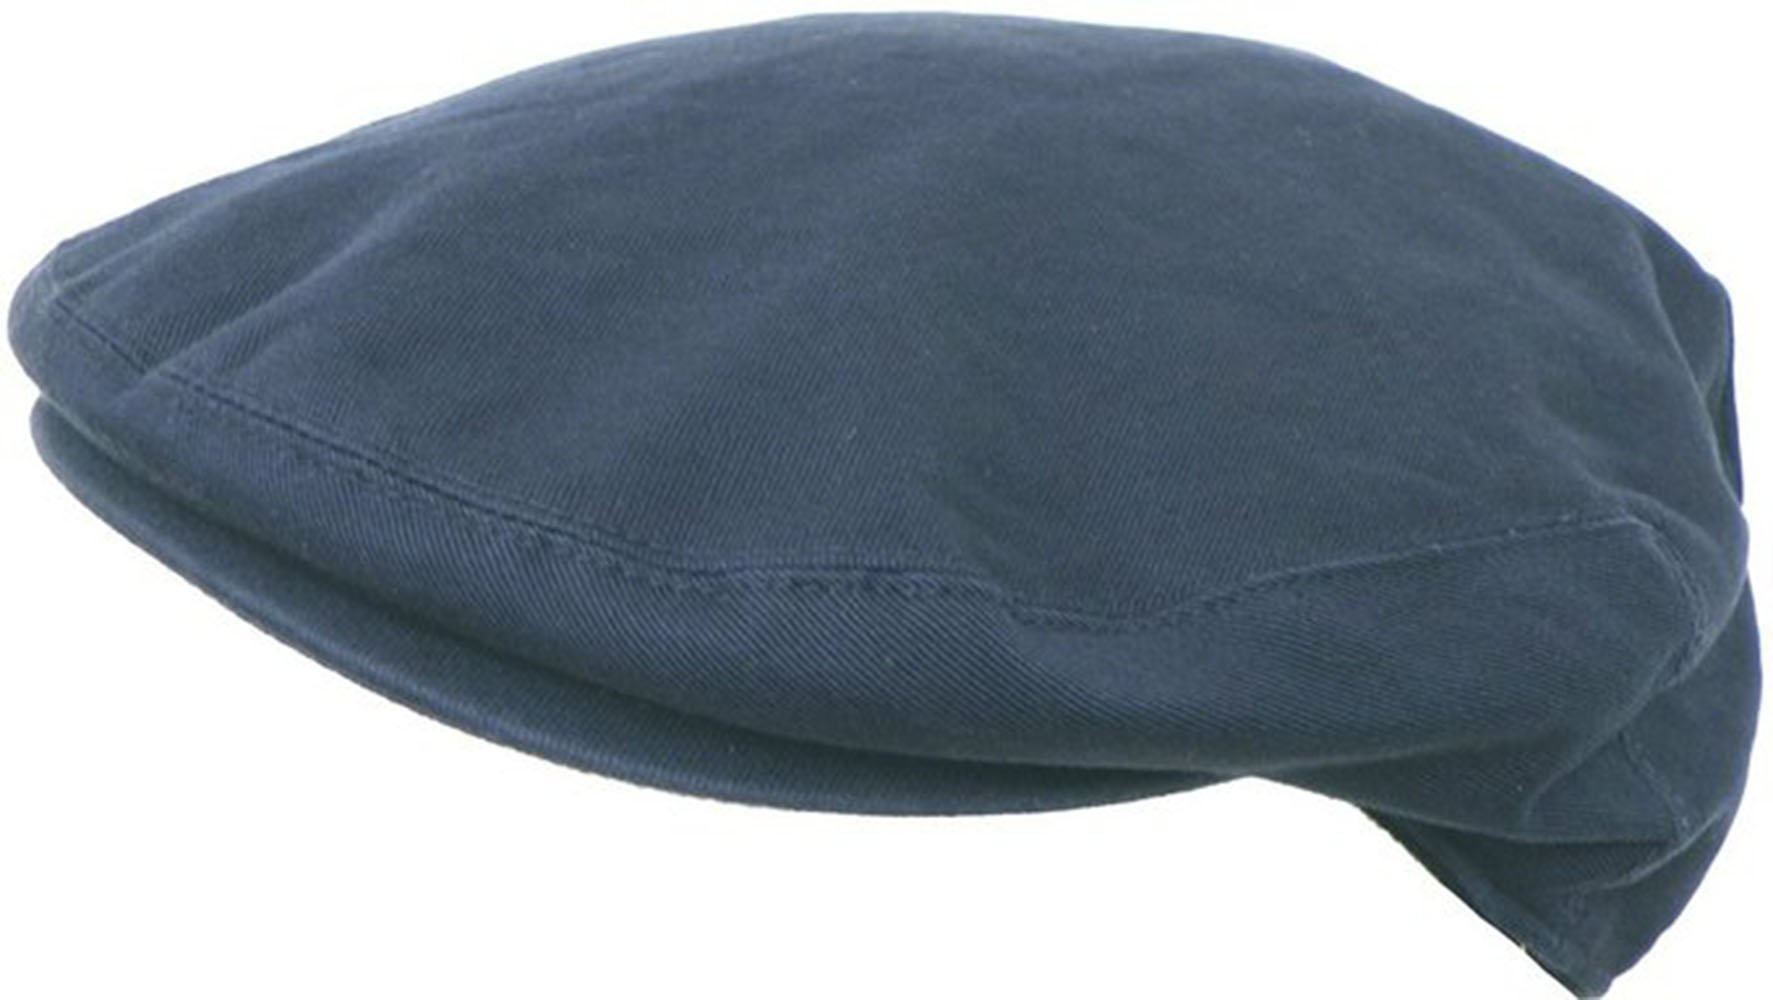 Sox Market Summer Cotton Ivy Scally Driving Hat Newsboy Golf Cap (Small, Navy)